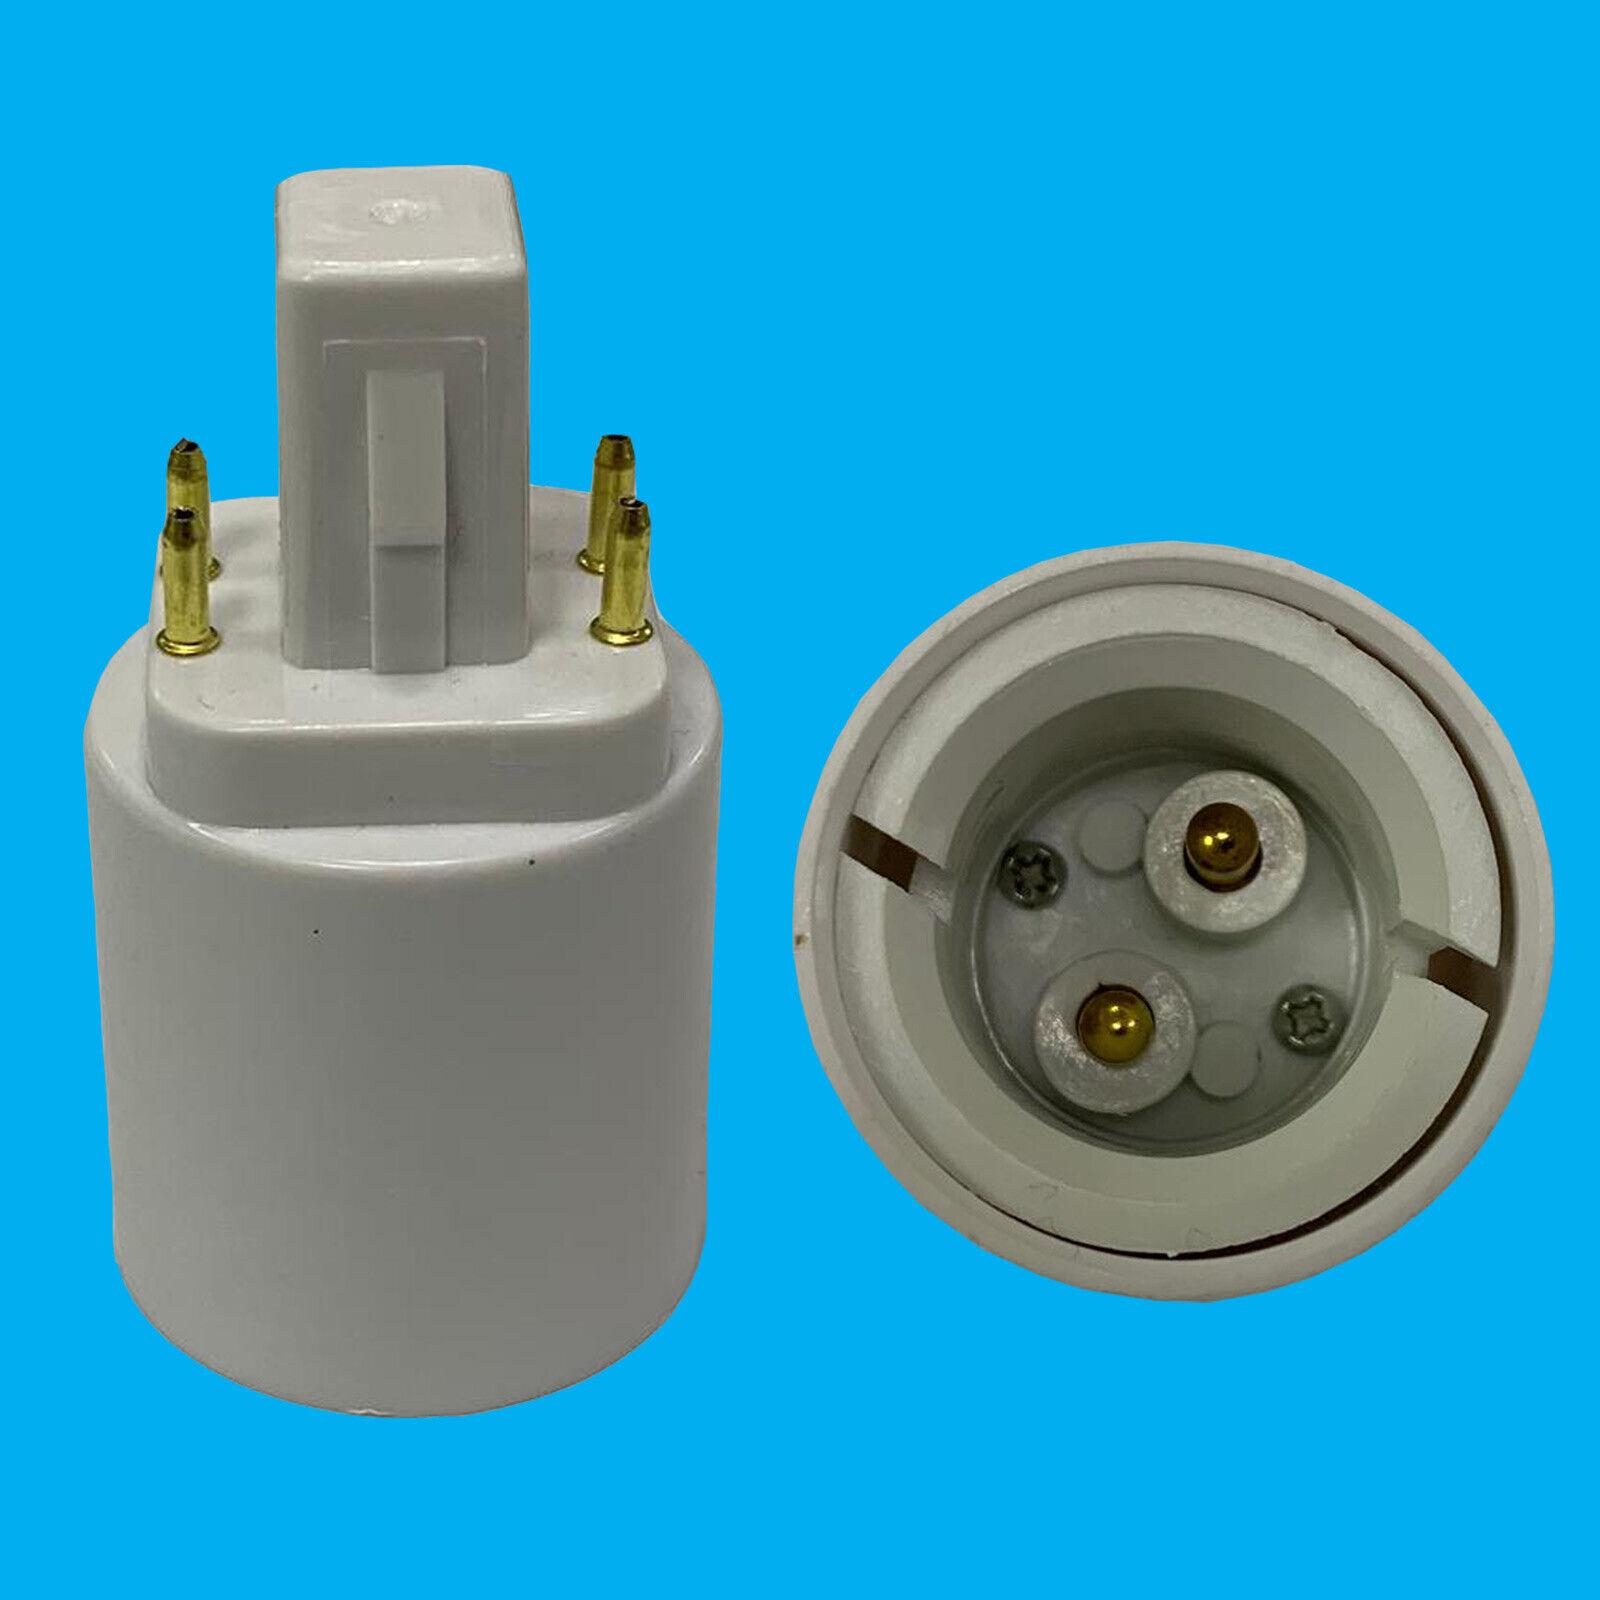 50x G24 4 Pin To BC B22 Bayonet Light Bulb Adaptor Lamp Fitting ConGrüner Holder